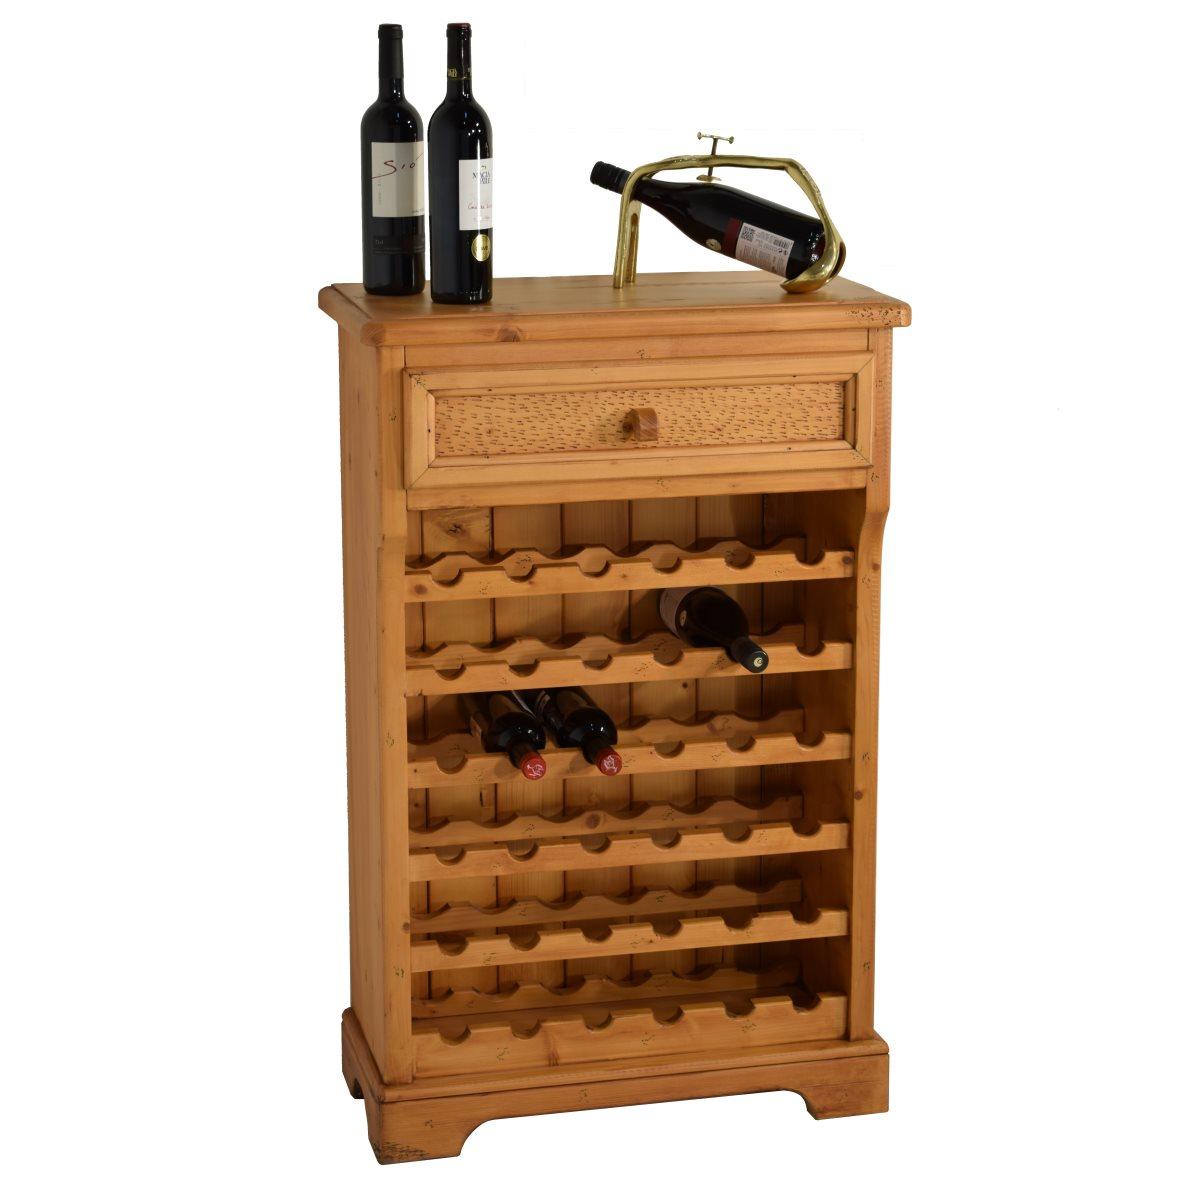 Botellero r stico de madera ecor stico venta de muebles - Botelleros de madera rusticos ...